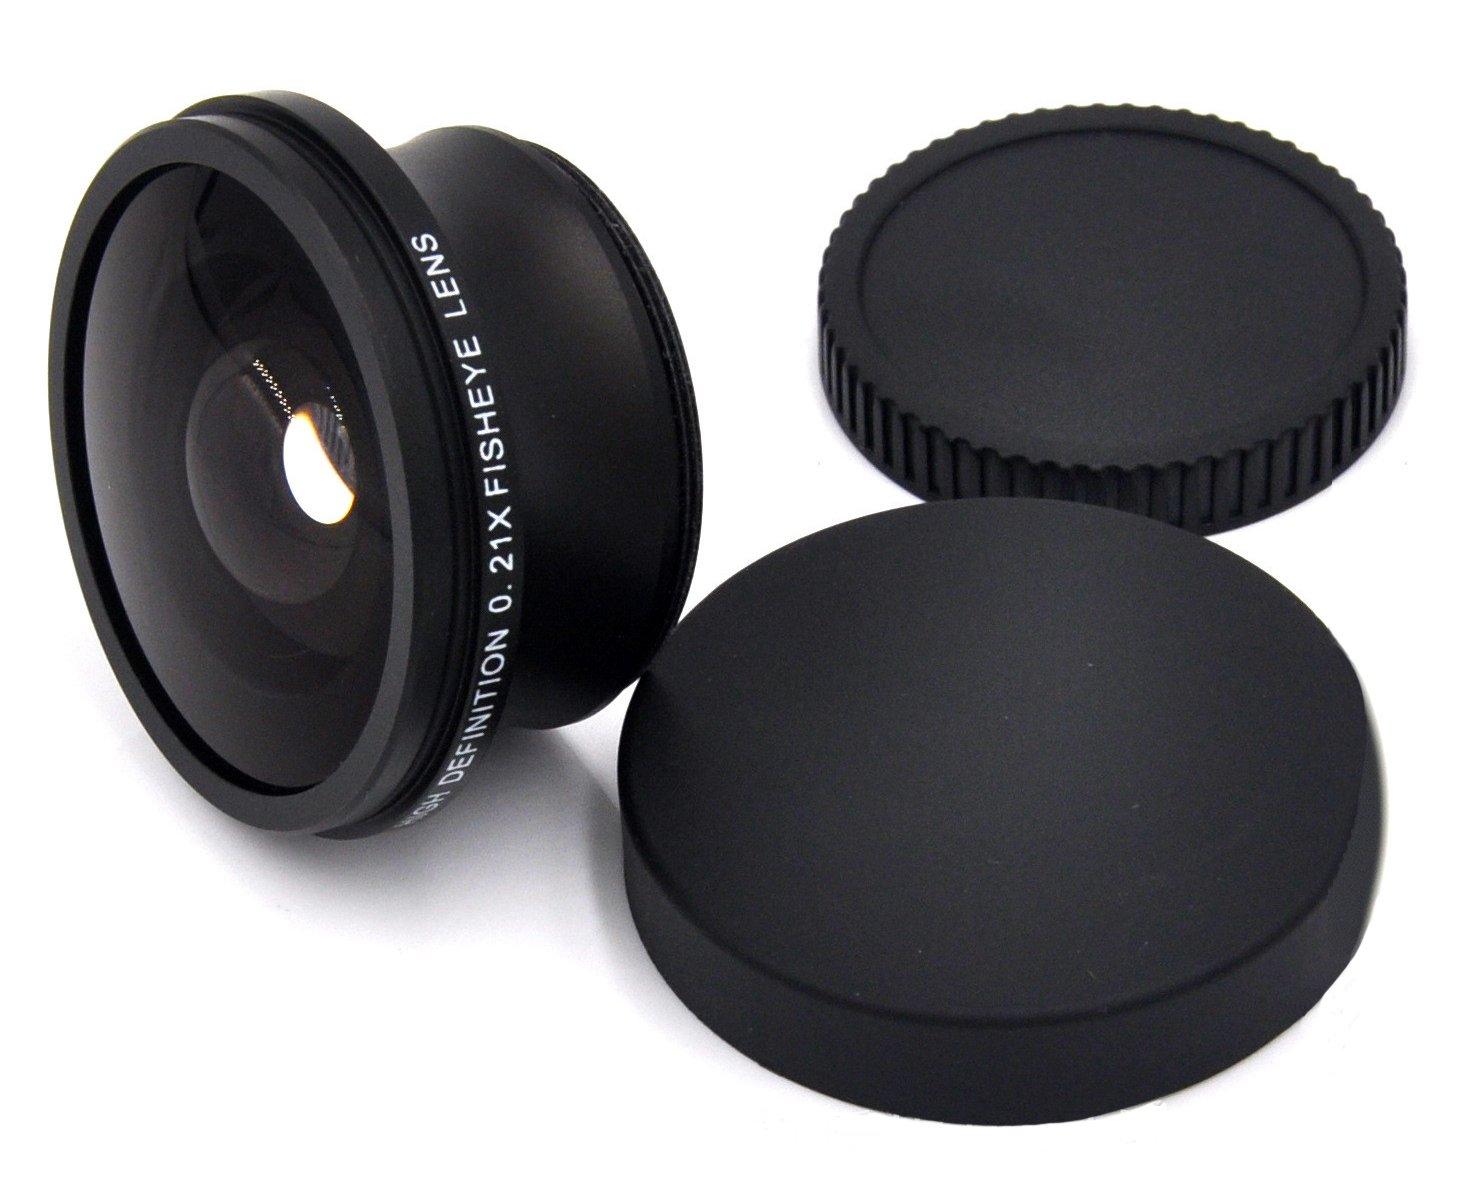 Video /& Still Photography 0.33x High Grade Fish-Eye Lens for The Sony Cyber-Shot DSC-RX10 III